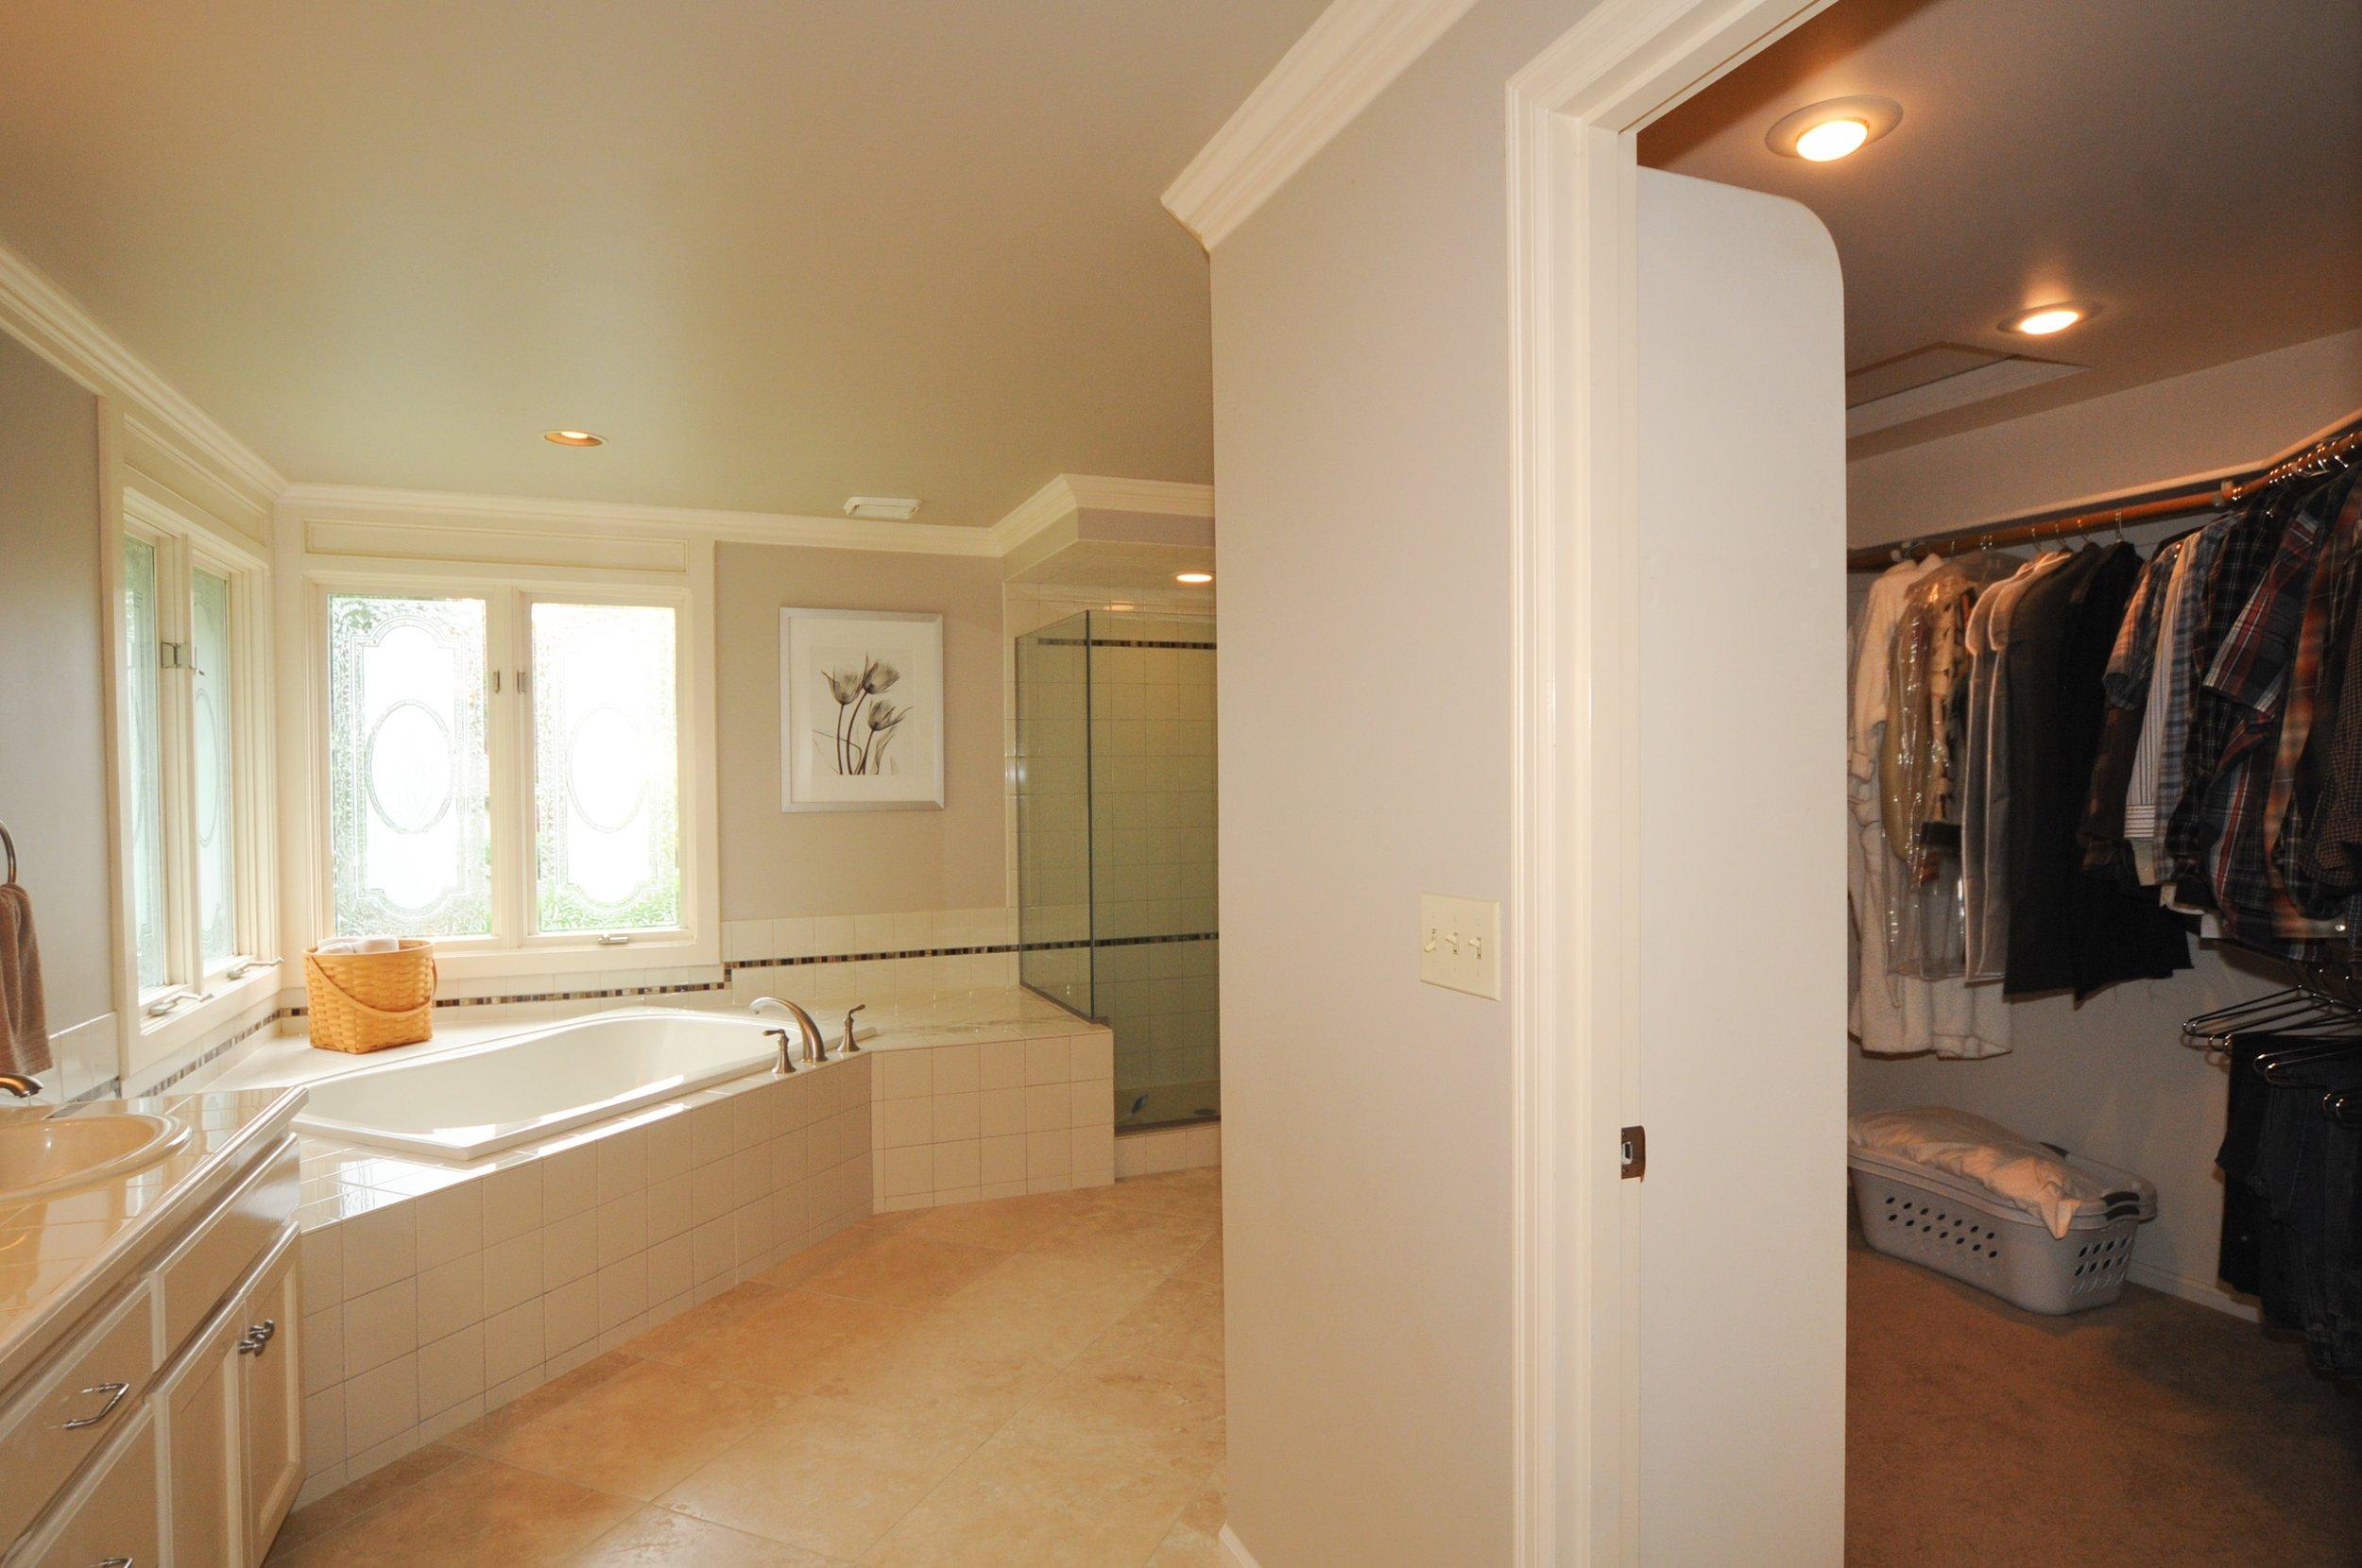 redmond_buchan_master bathroom and closet.jpg